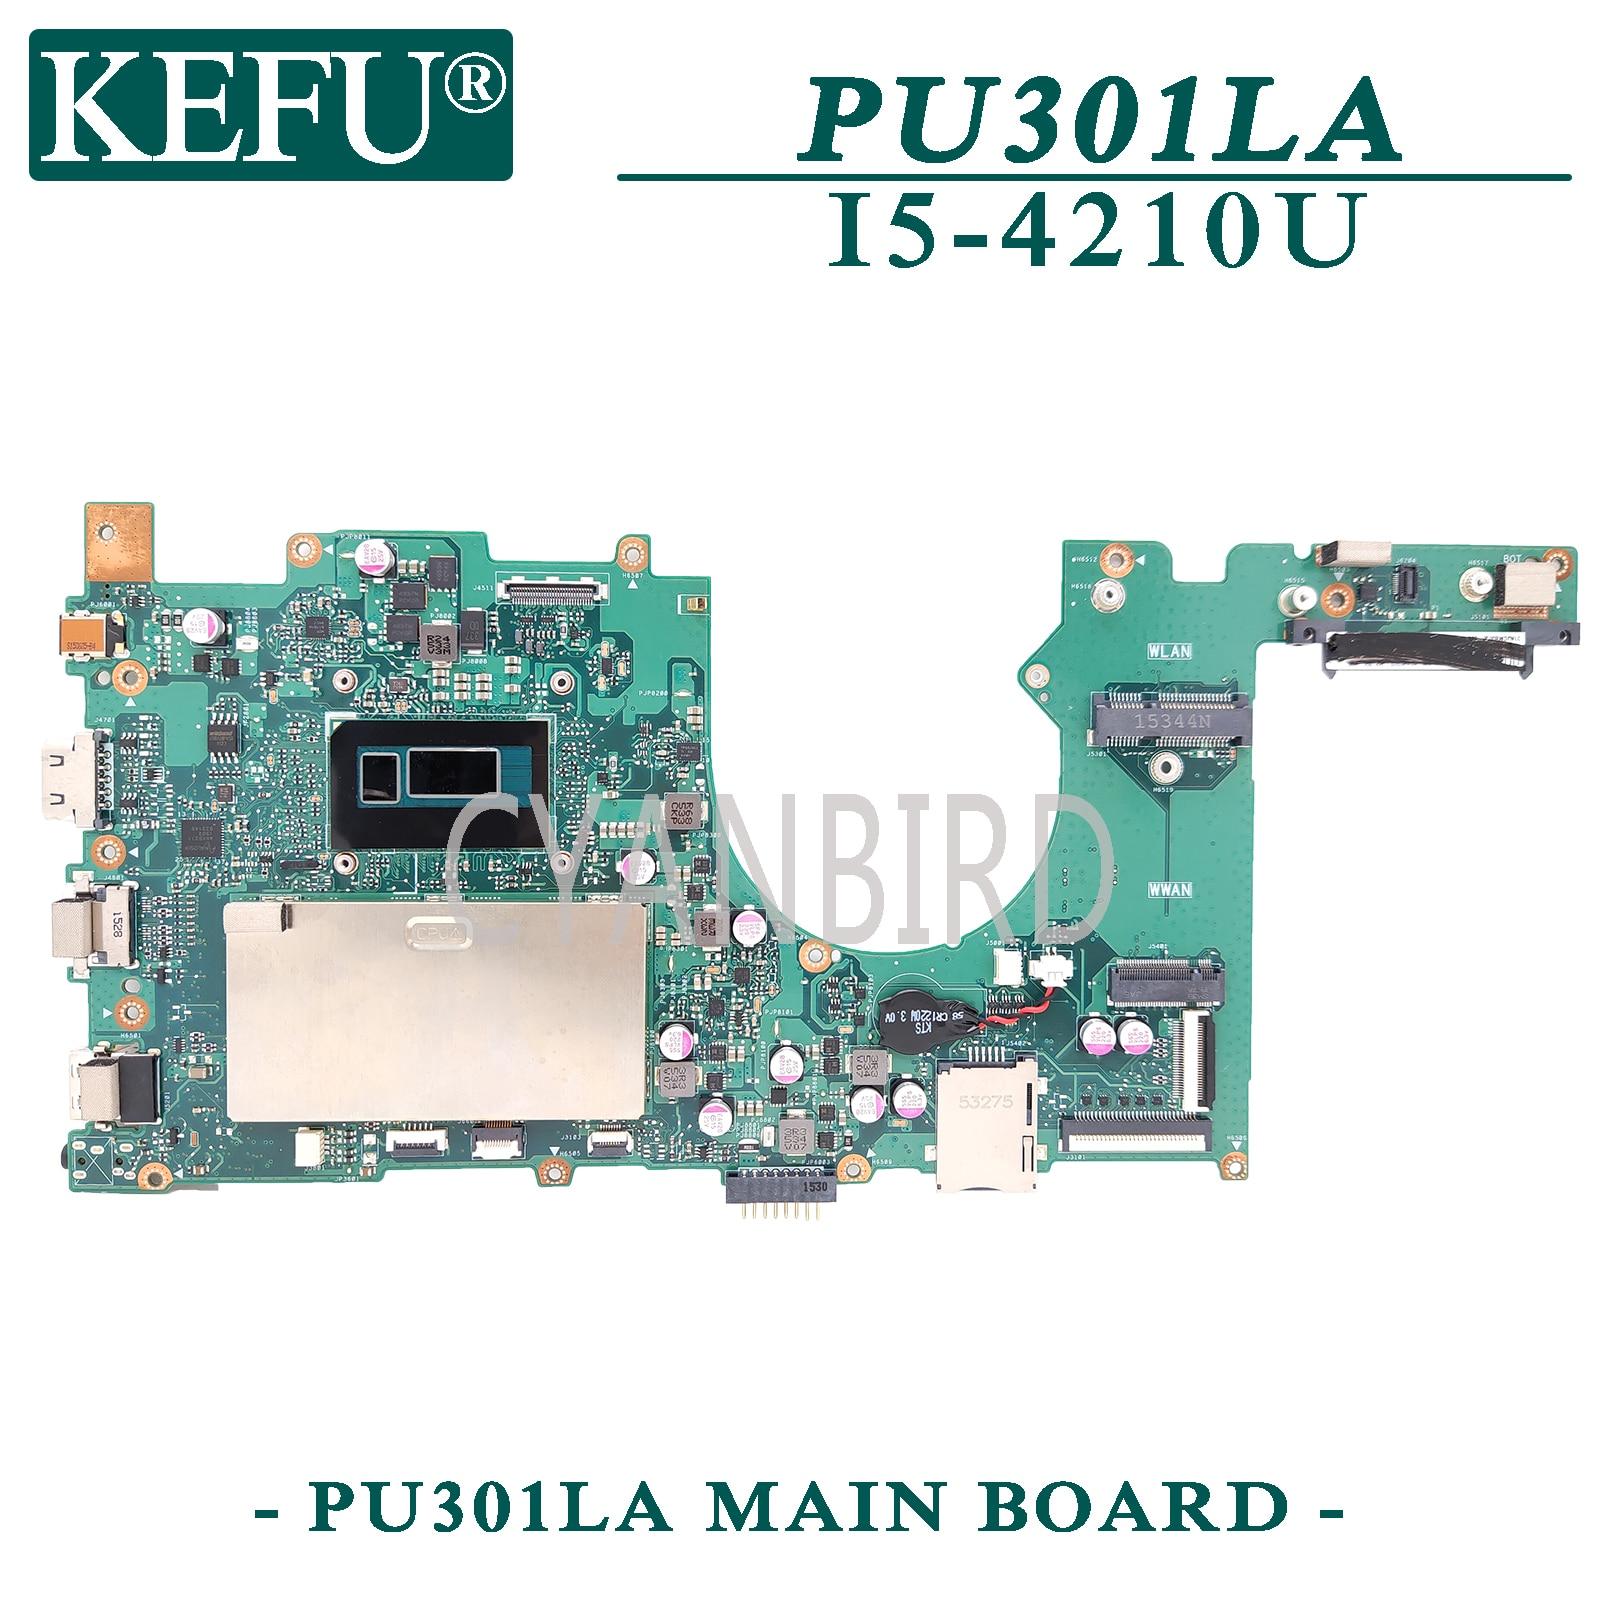 KEFU PU301LA اللوحة الرئيسية الأصلية لشركة آسوس PU301LA PU301L مع I5-4210U اللوحة الأم للكمبيوتر المحمول